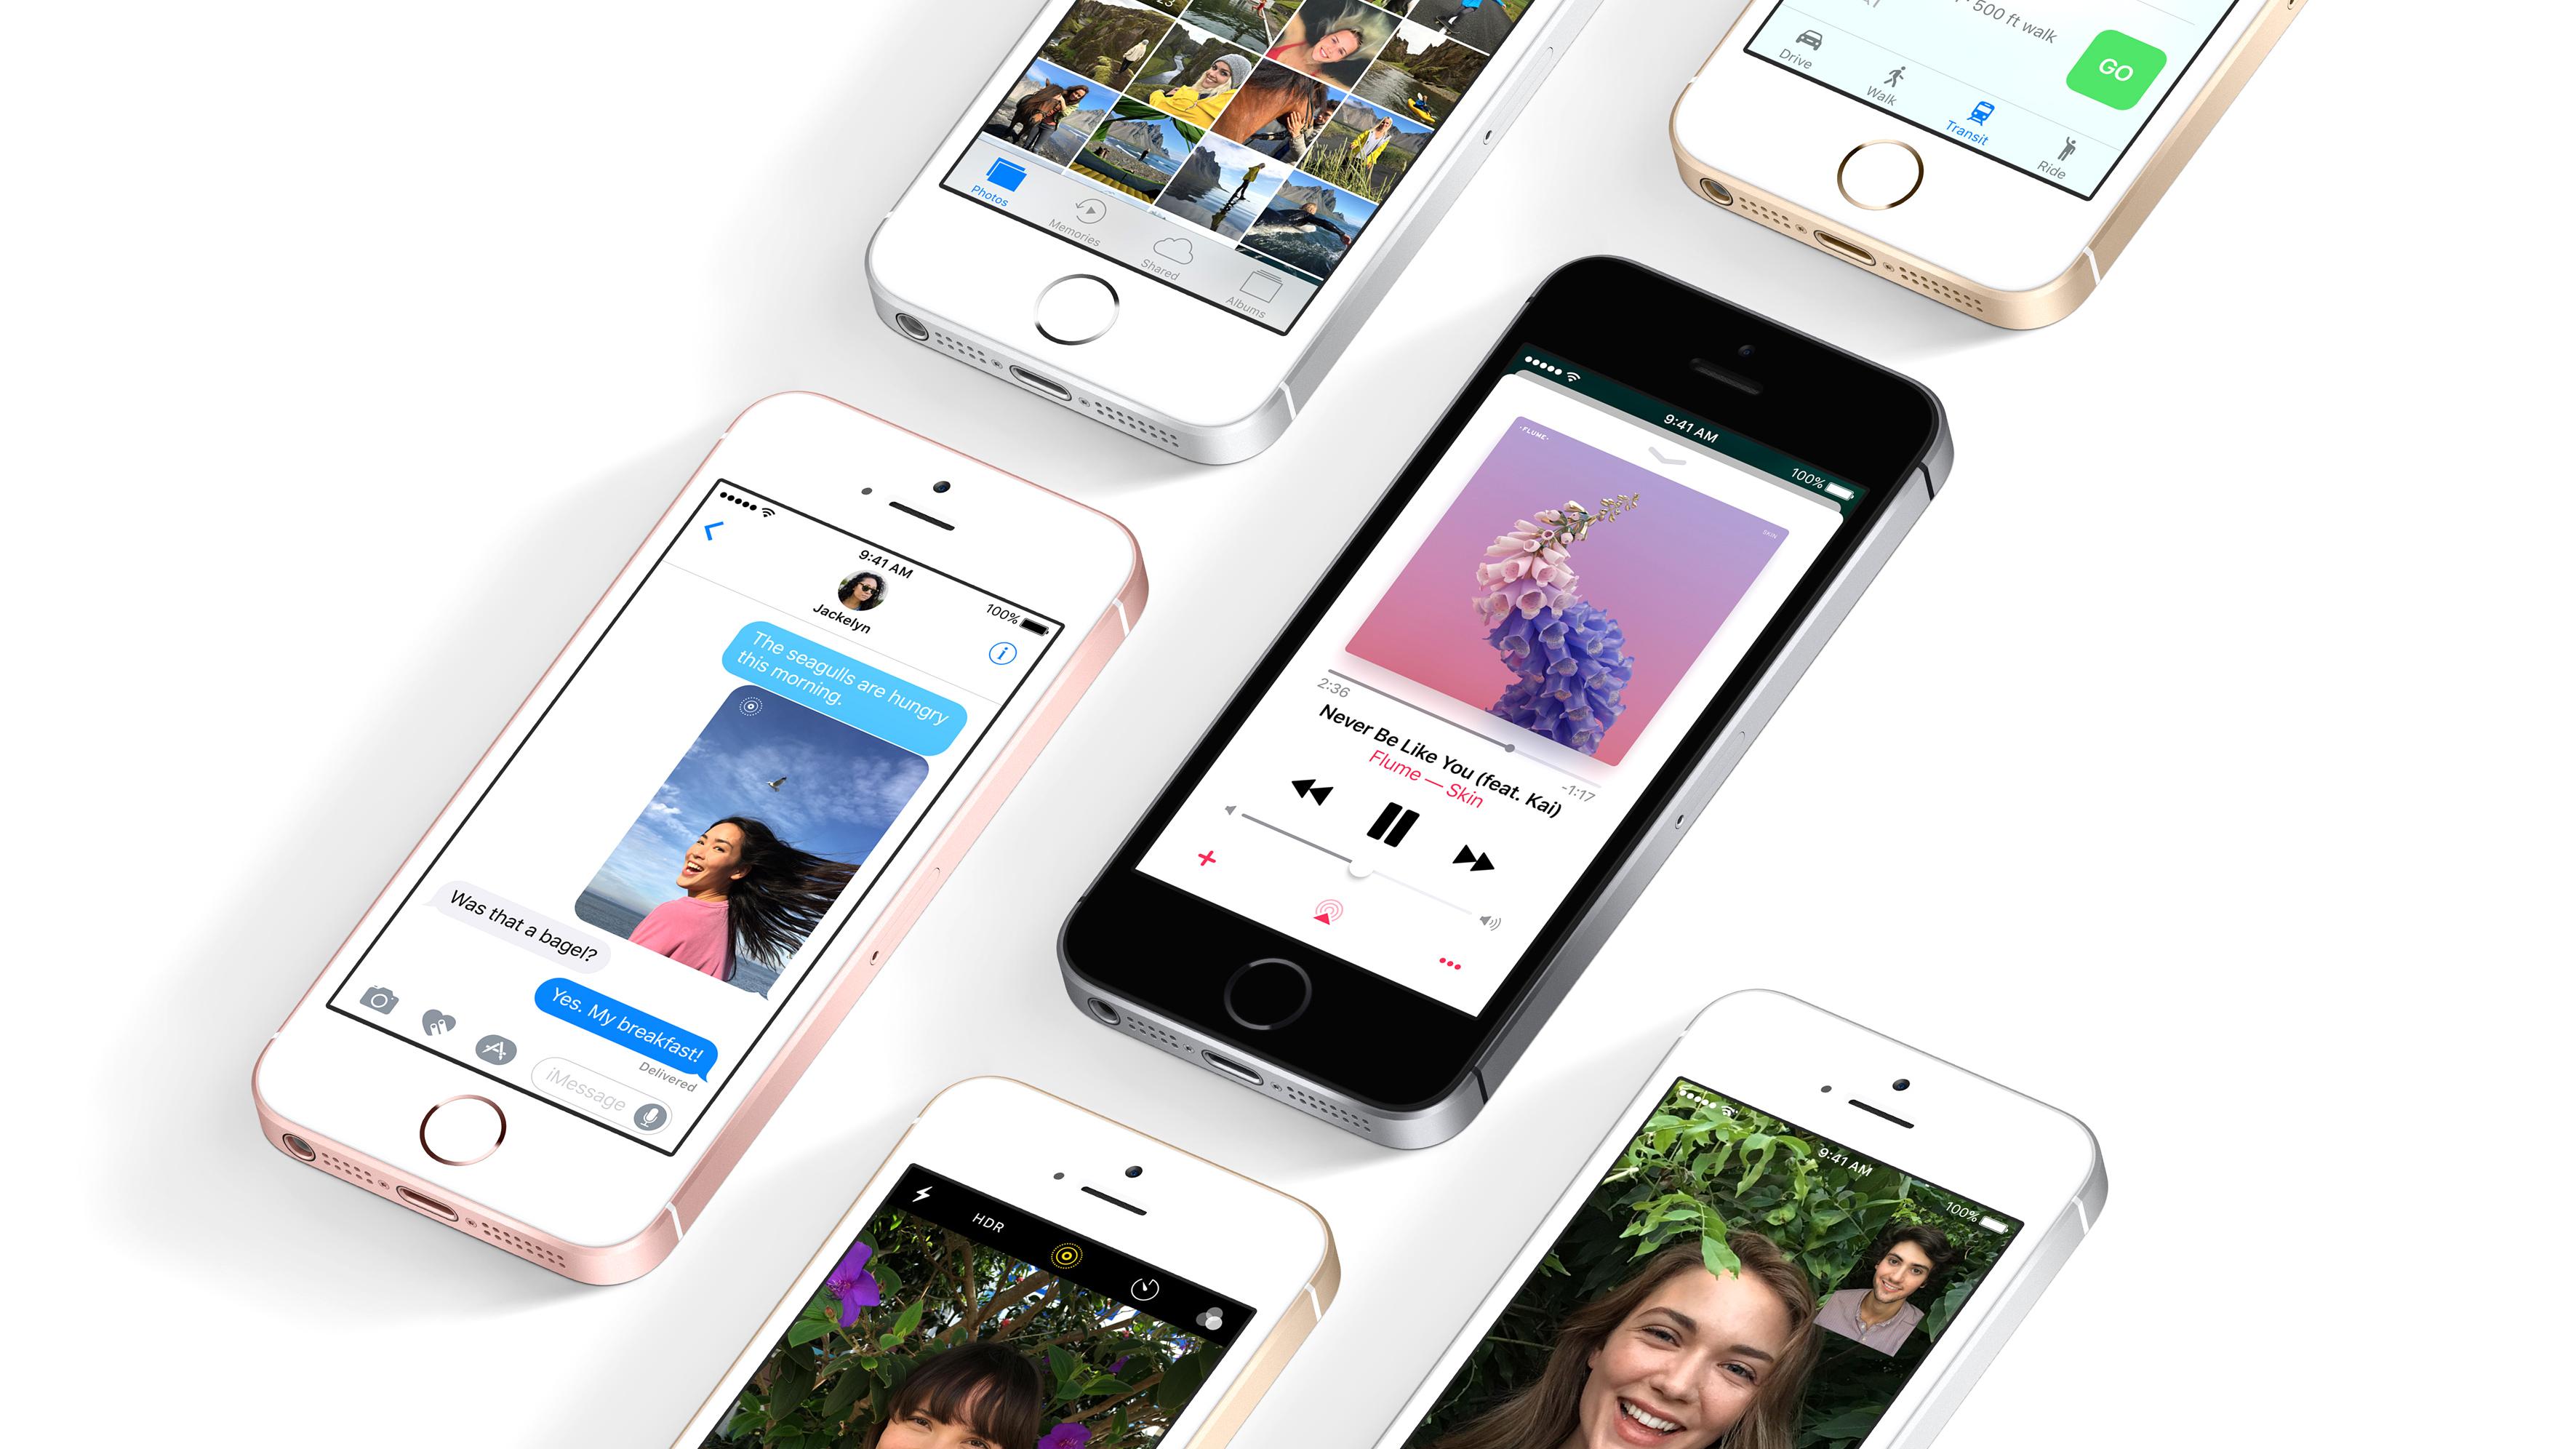 IPhone SE 2 Neues Mini Soll Schon Bald Erscheinen GIGA